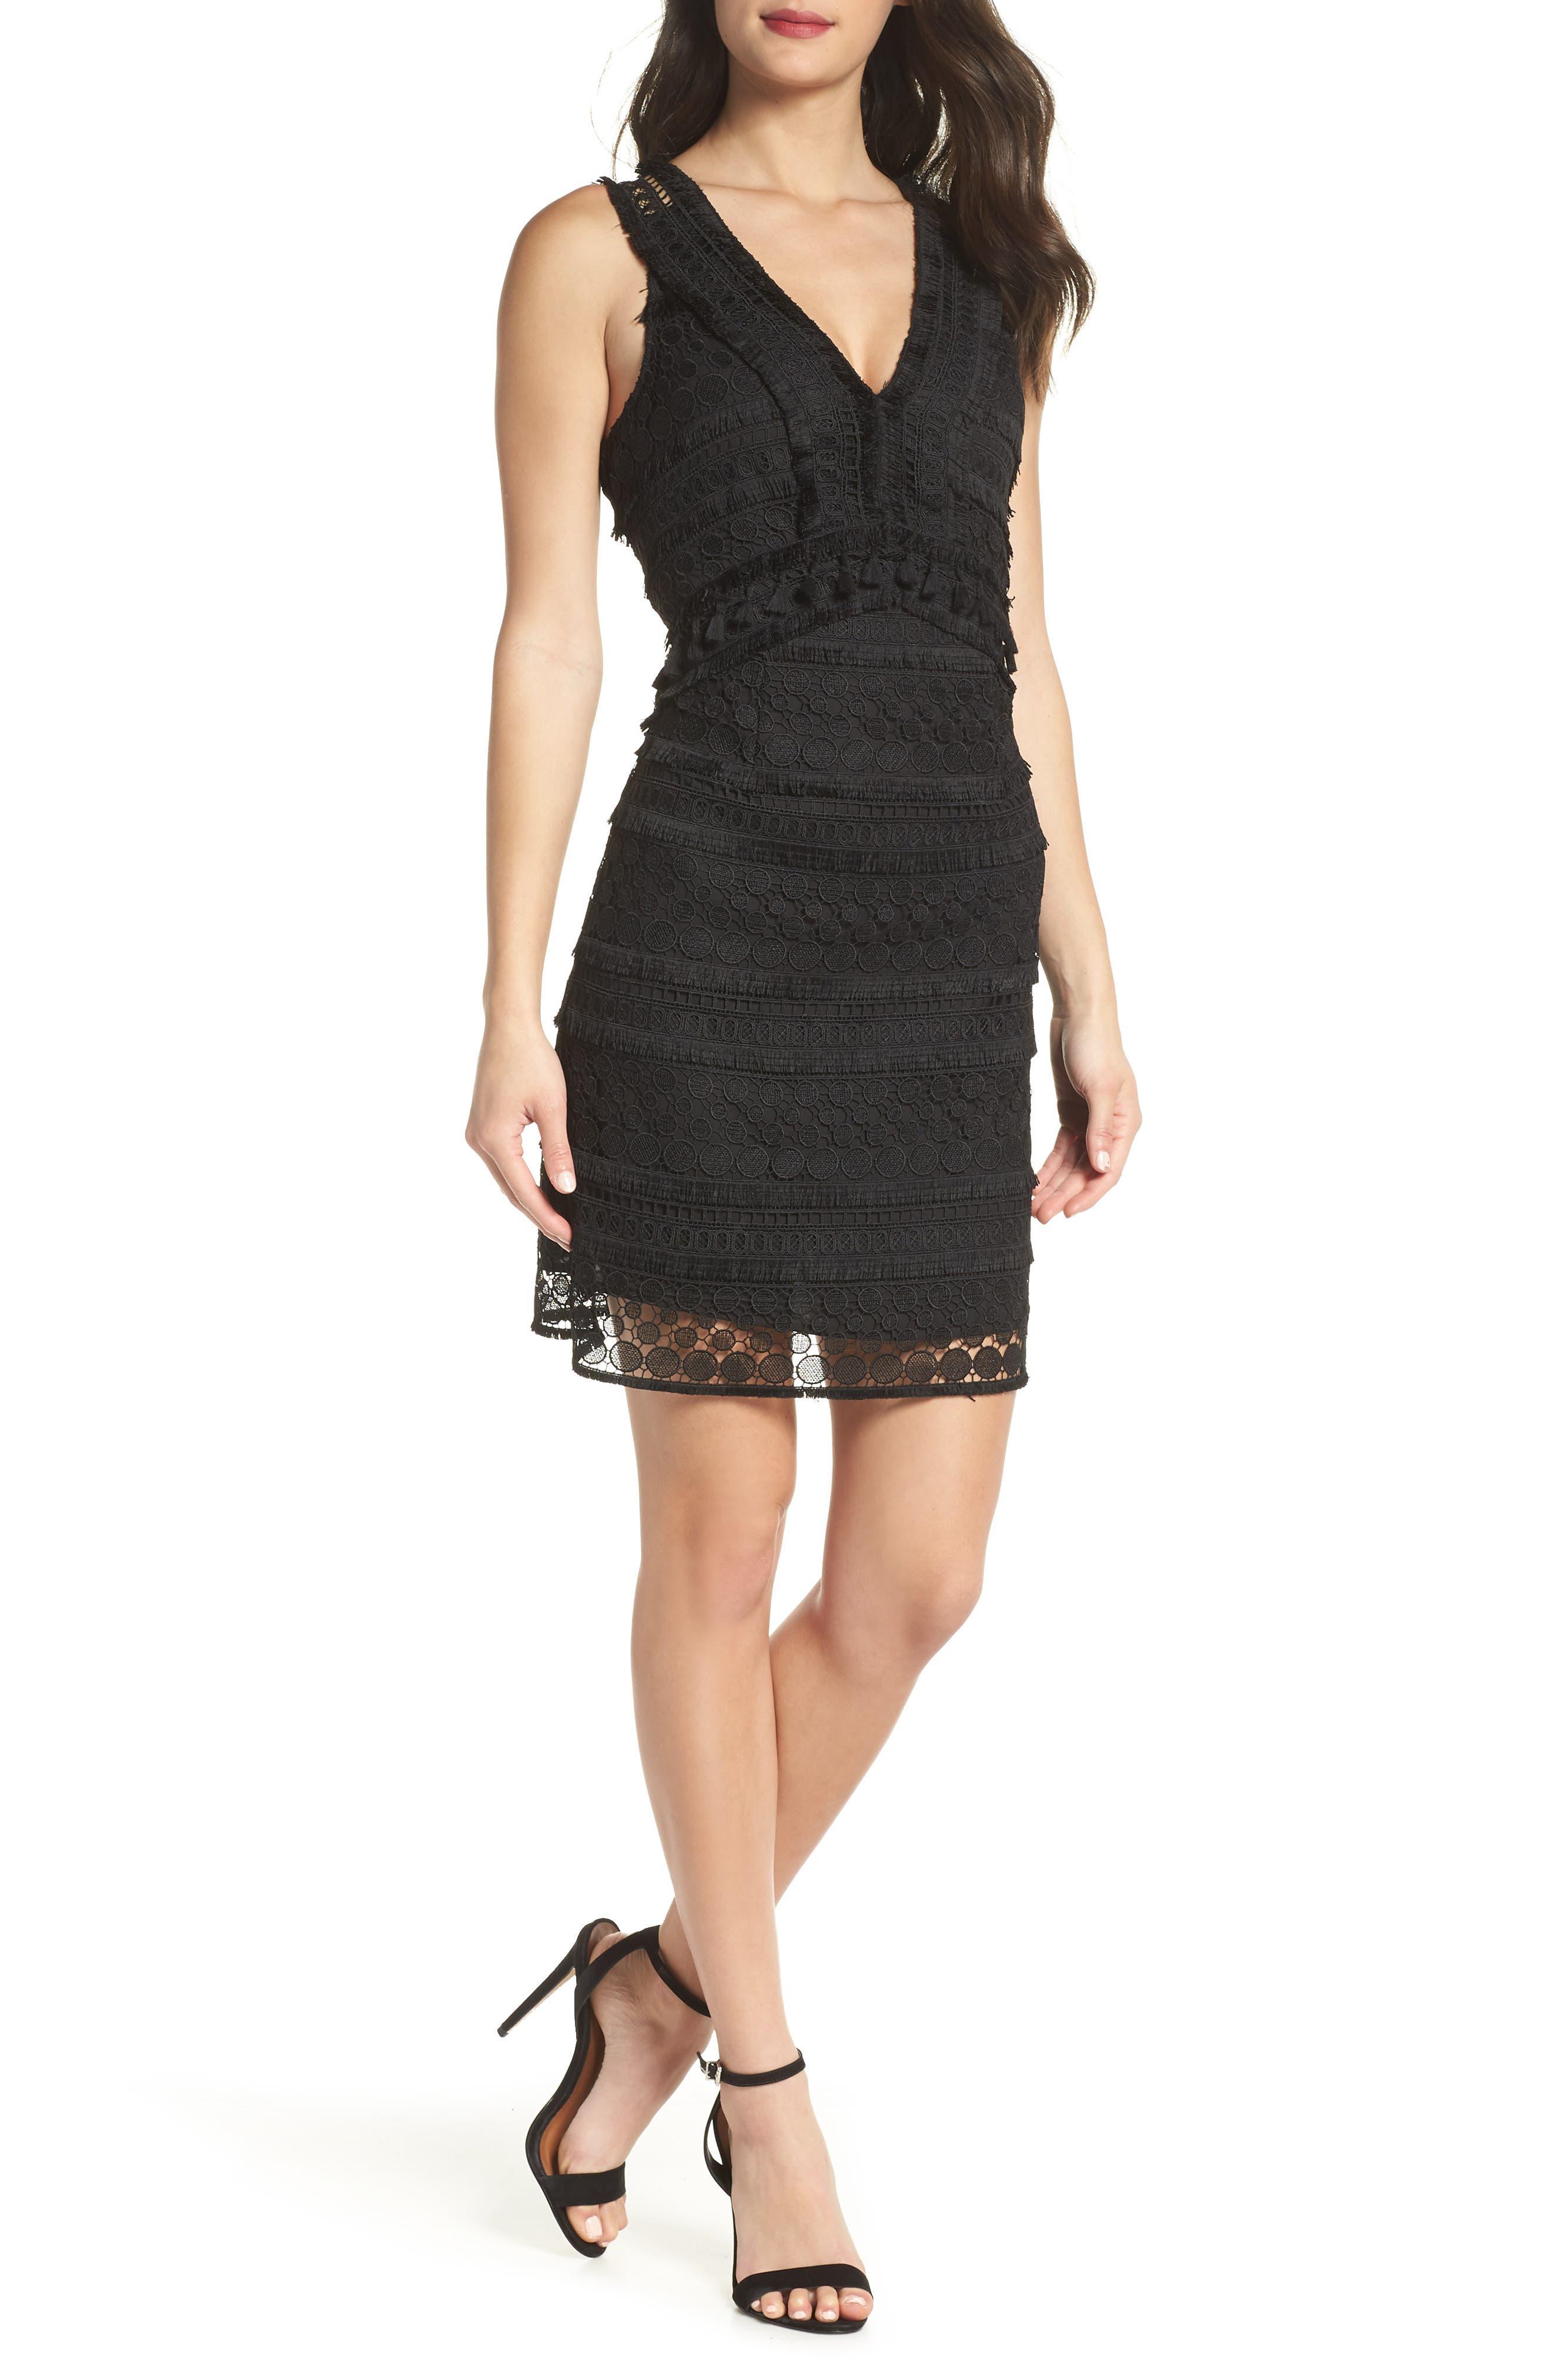 SAM EDELMAN Lace Sheath Dress, Main, color, 001